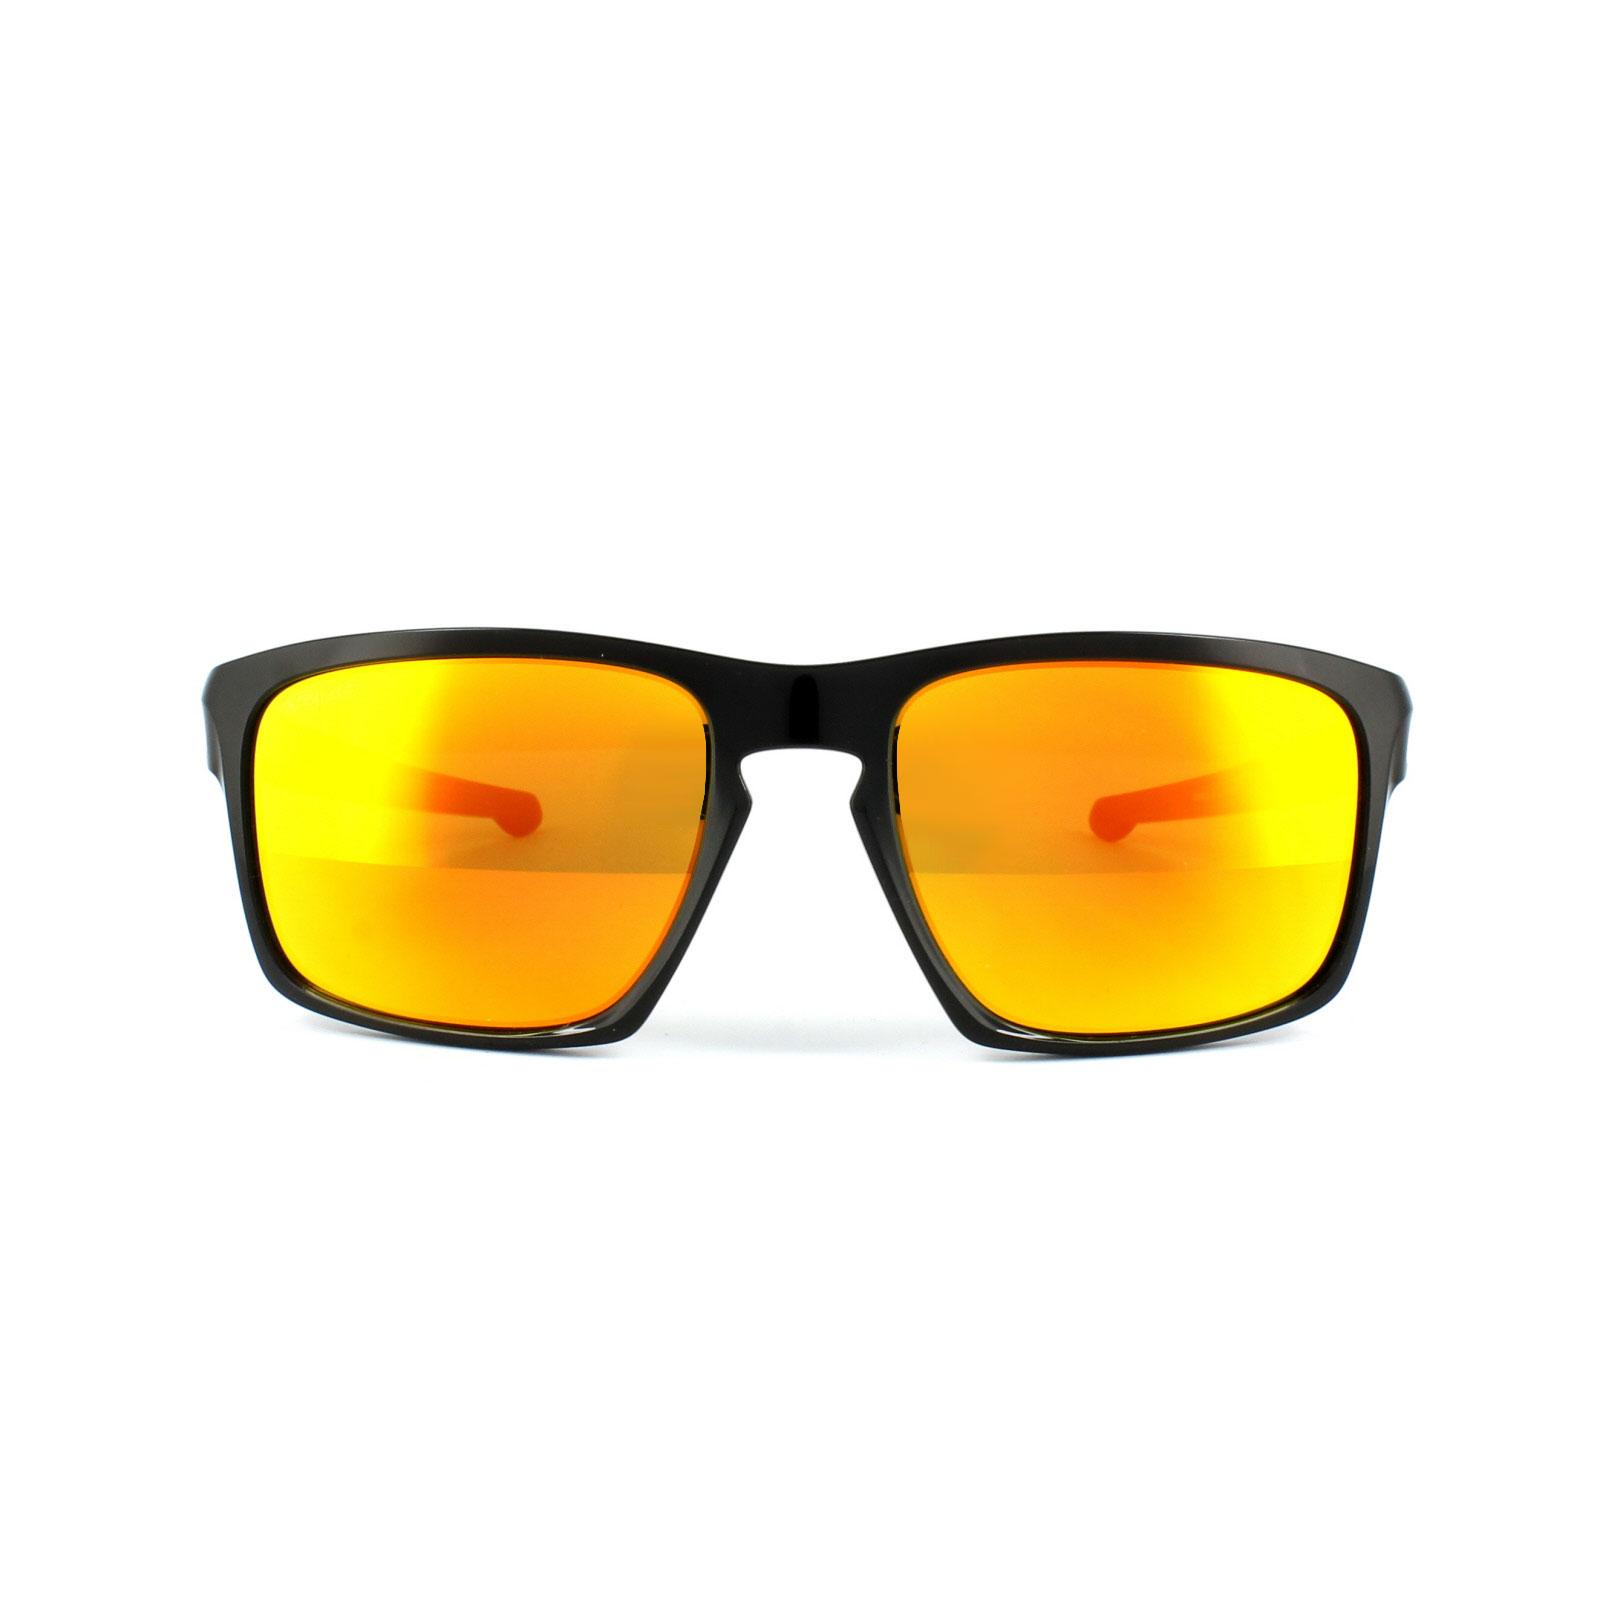 fddb6ec9ca Sentinel Thumbnail 2. Sentinel Oakley Sunglasses Sliver OO9262-27 Valentino  Rossi Polished Black Fire Iridium